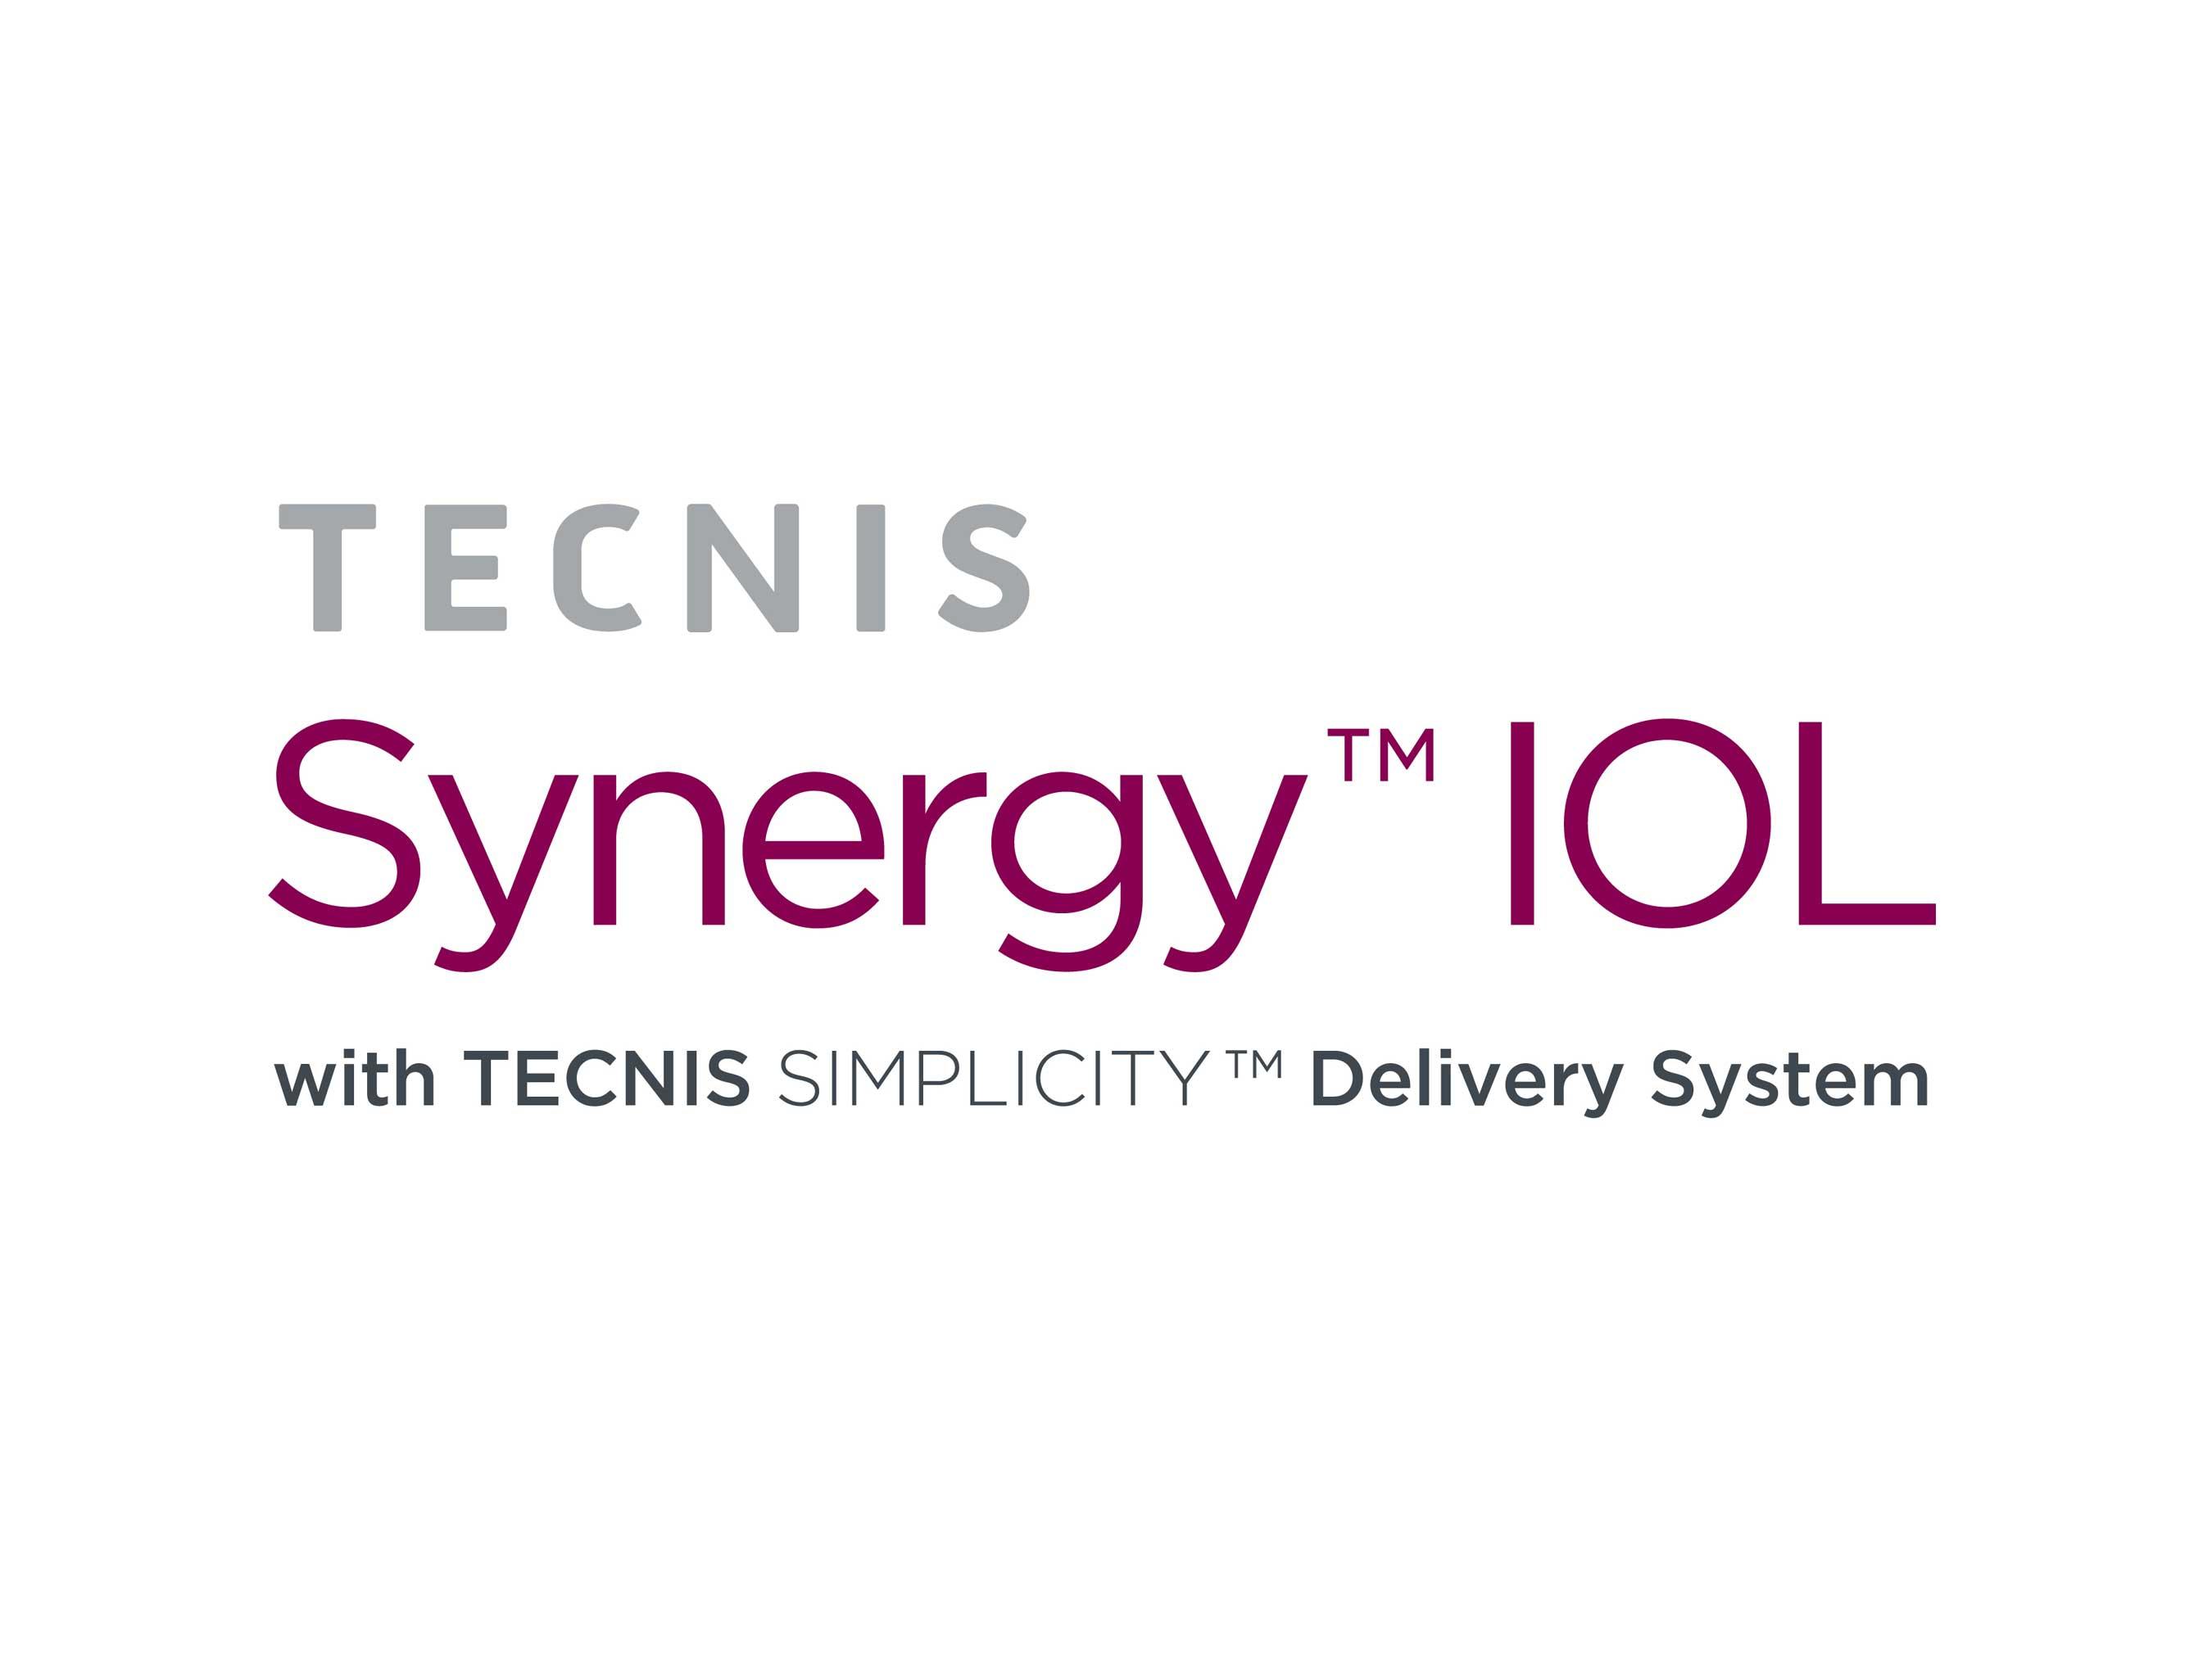 TECNIS Synergy